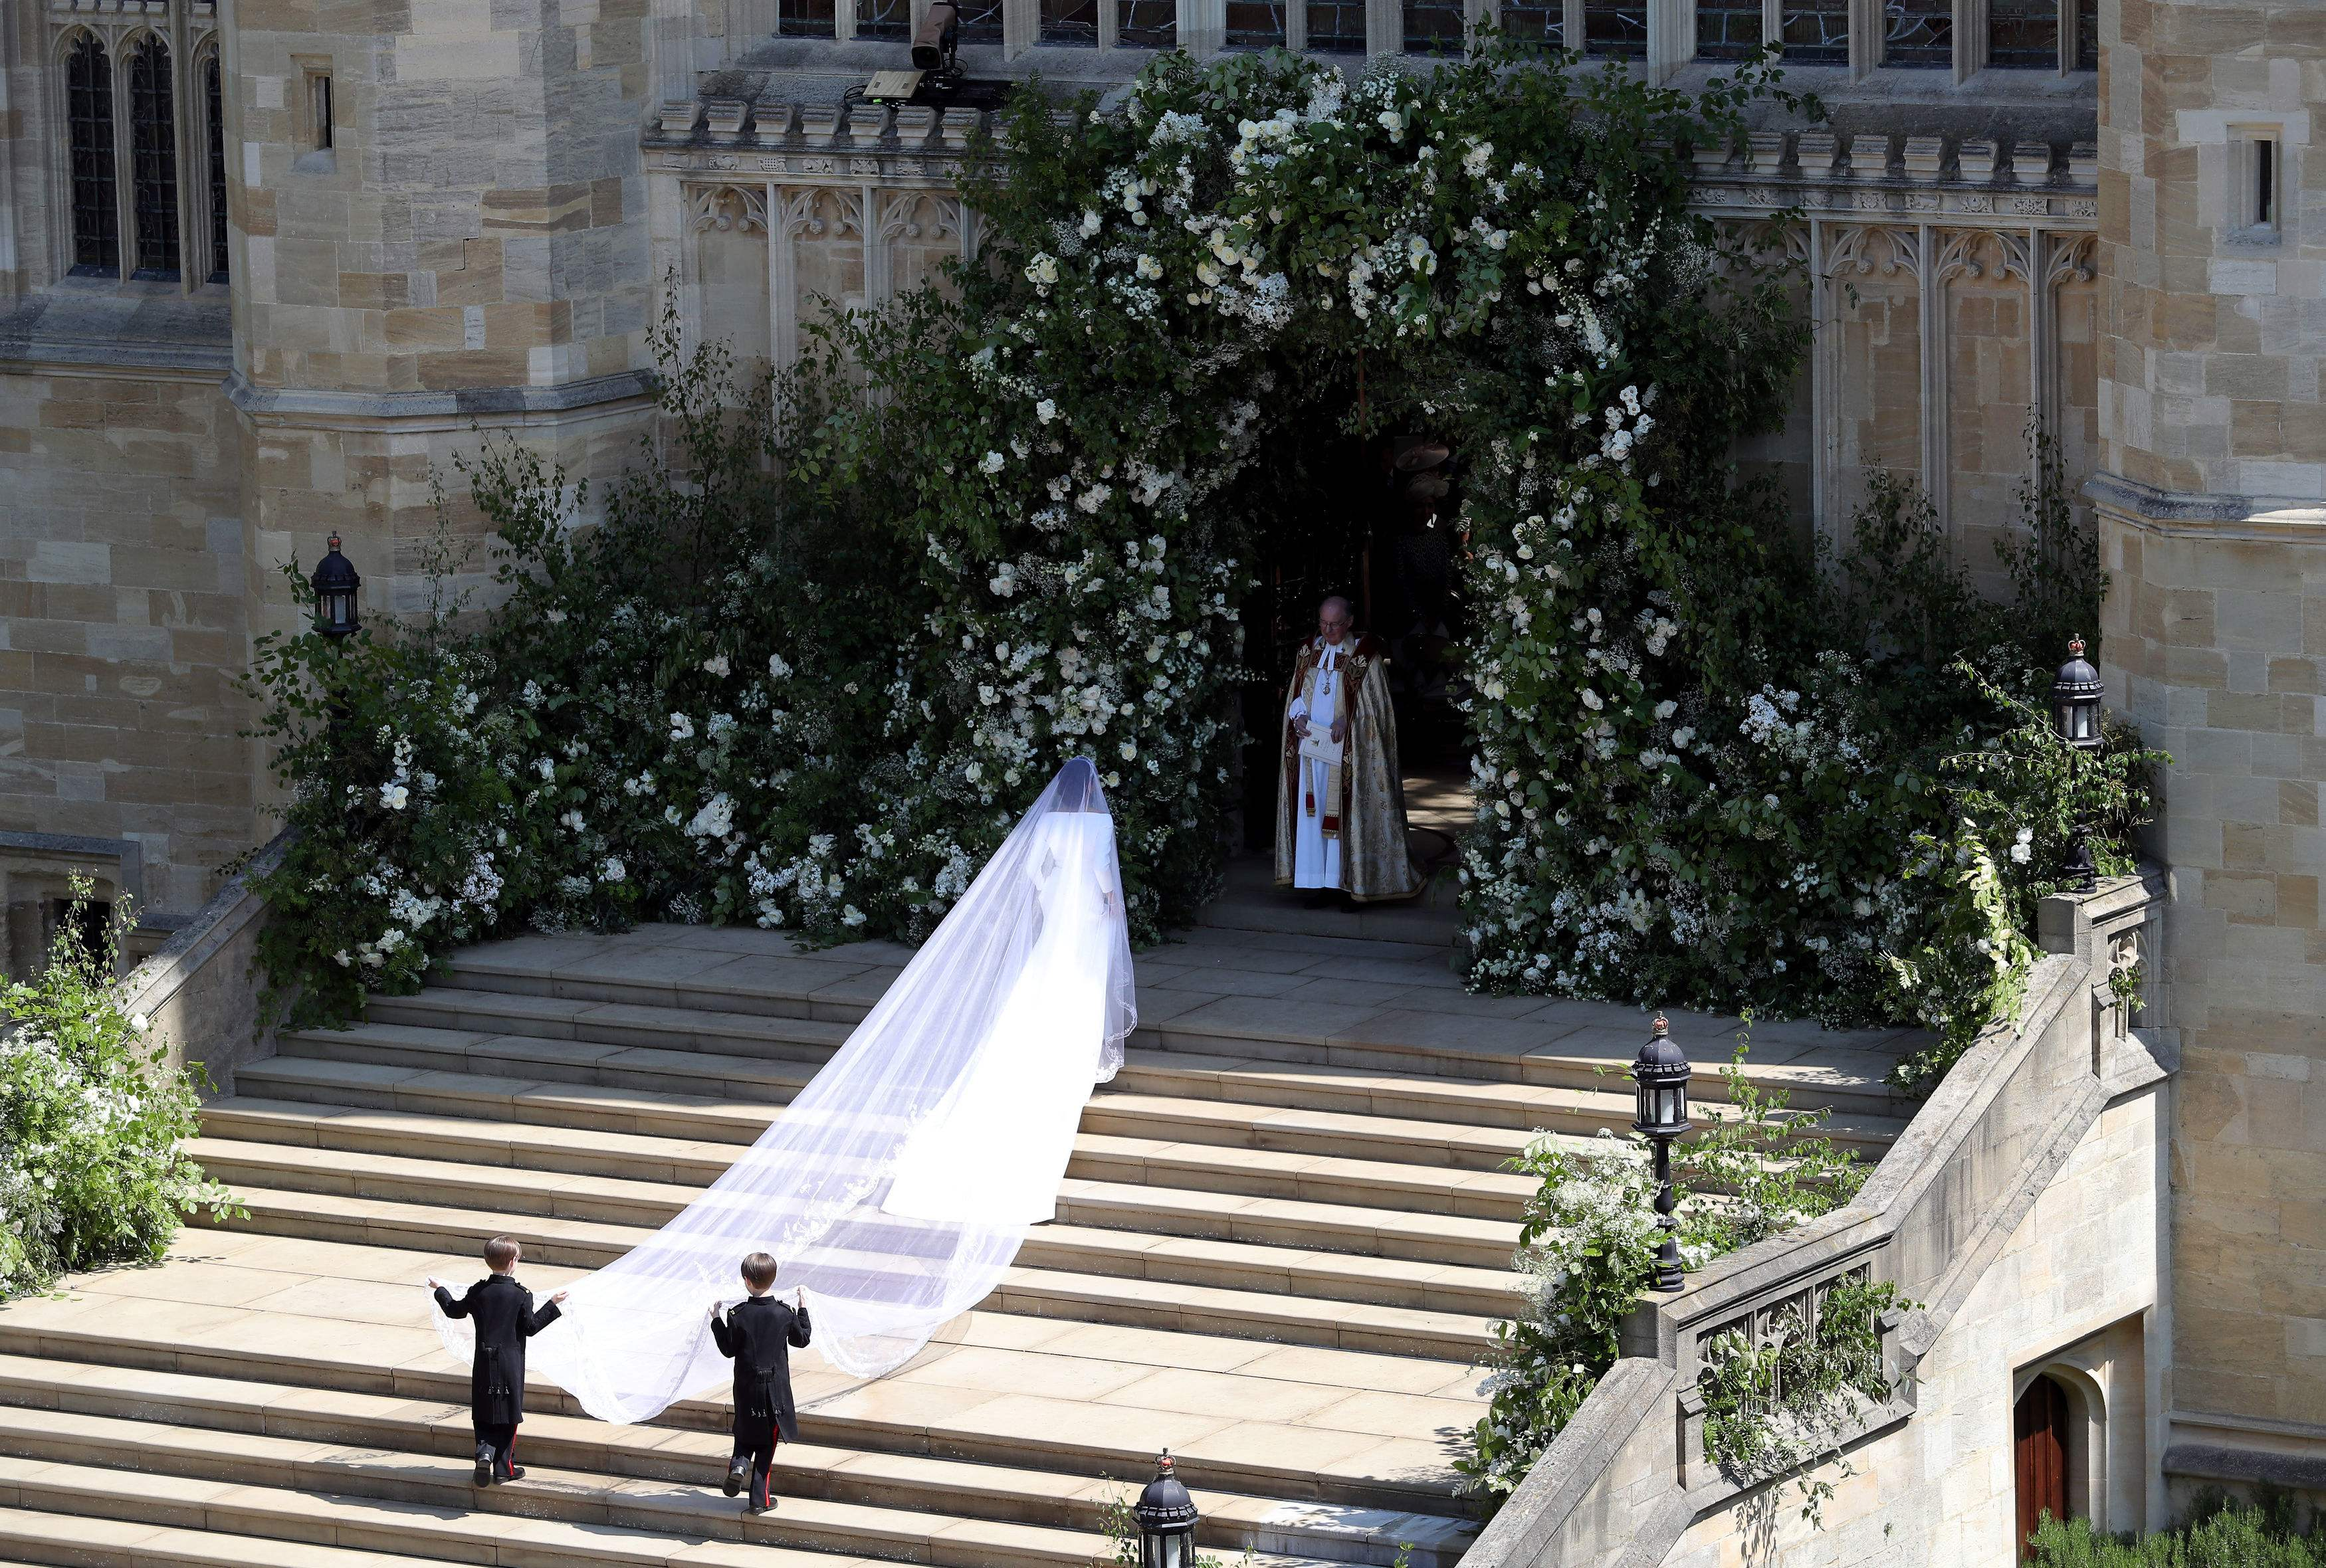 Royal wedding 2018: Prince Harry, Meghan Markle marry - The